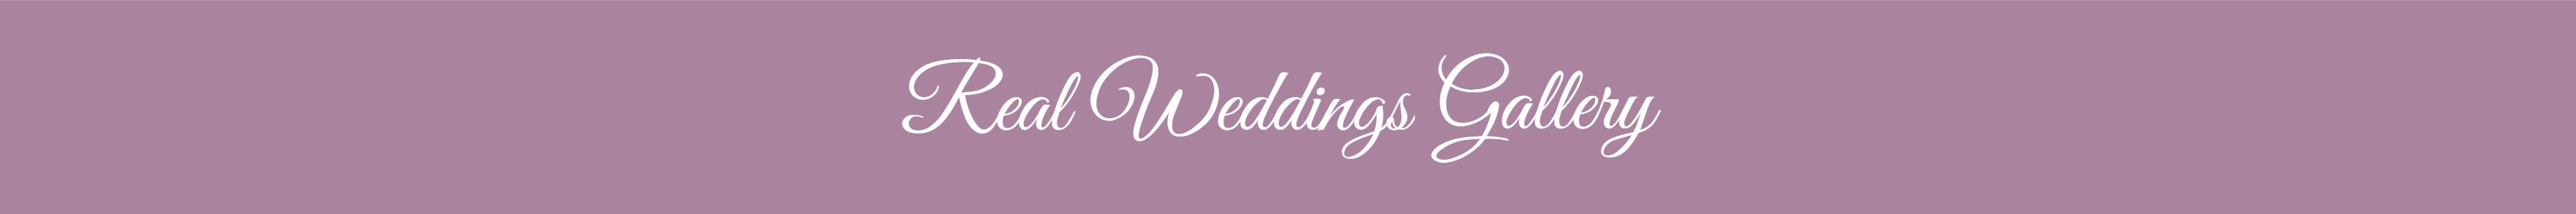 wedding planner dubai